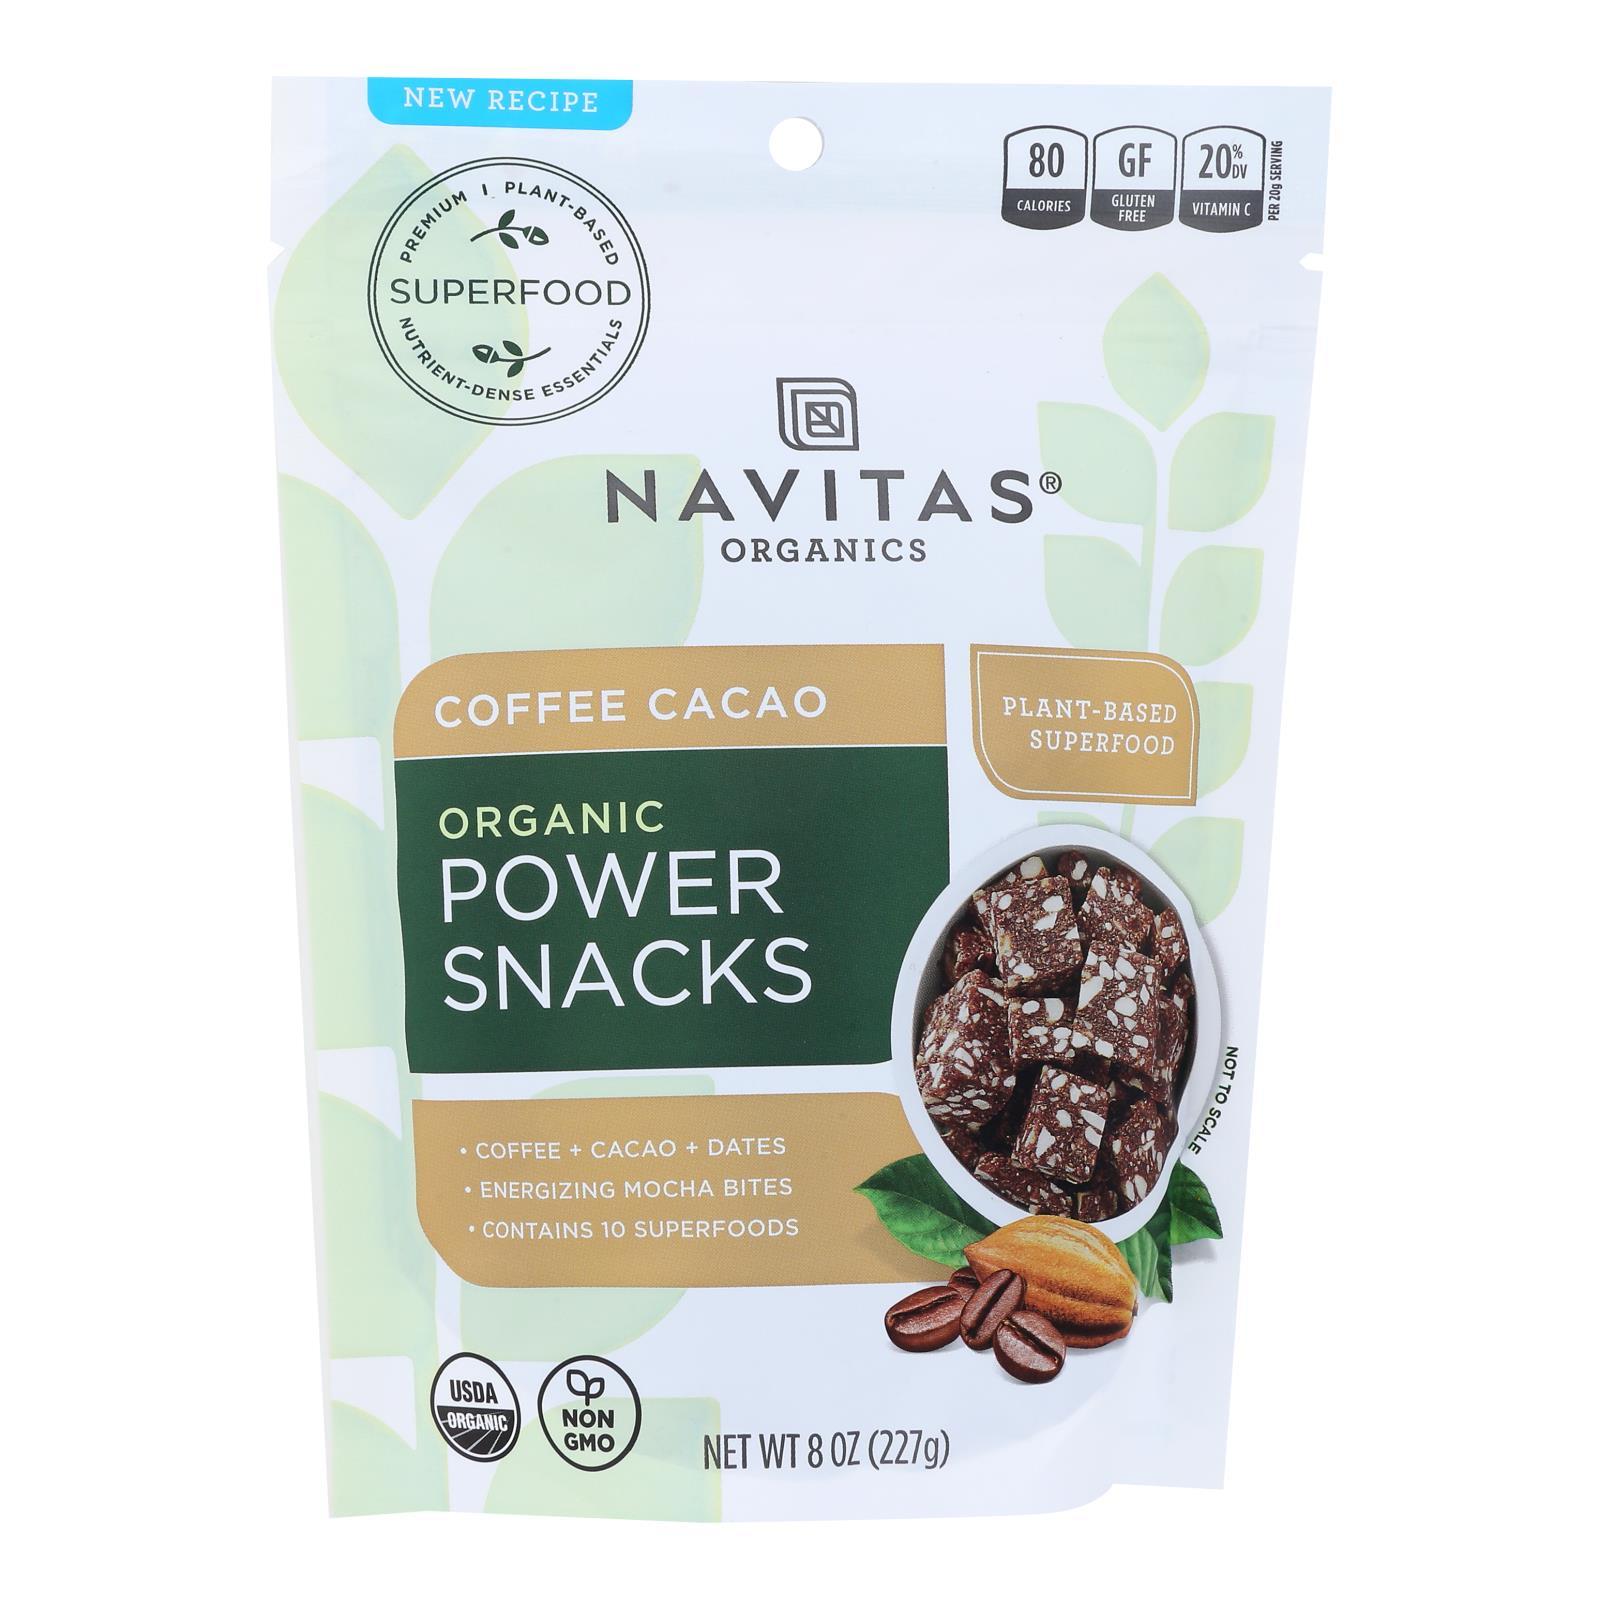 Navitas Naturals Snacks - Organic - Power - Coffee Cacao - 8 oz - case of 12